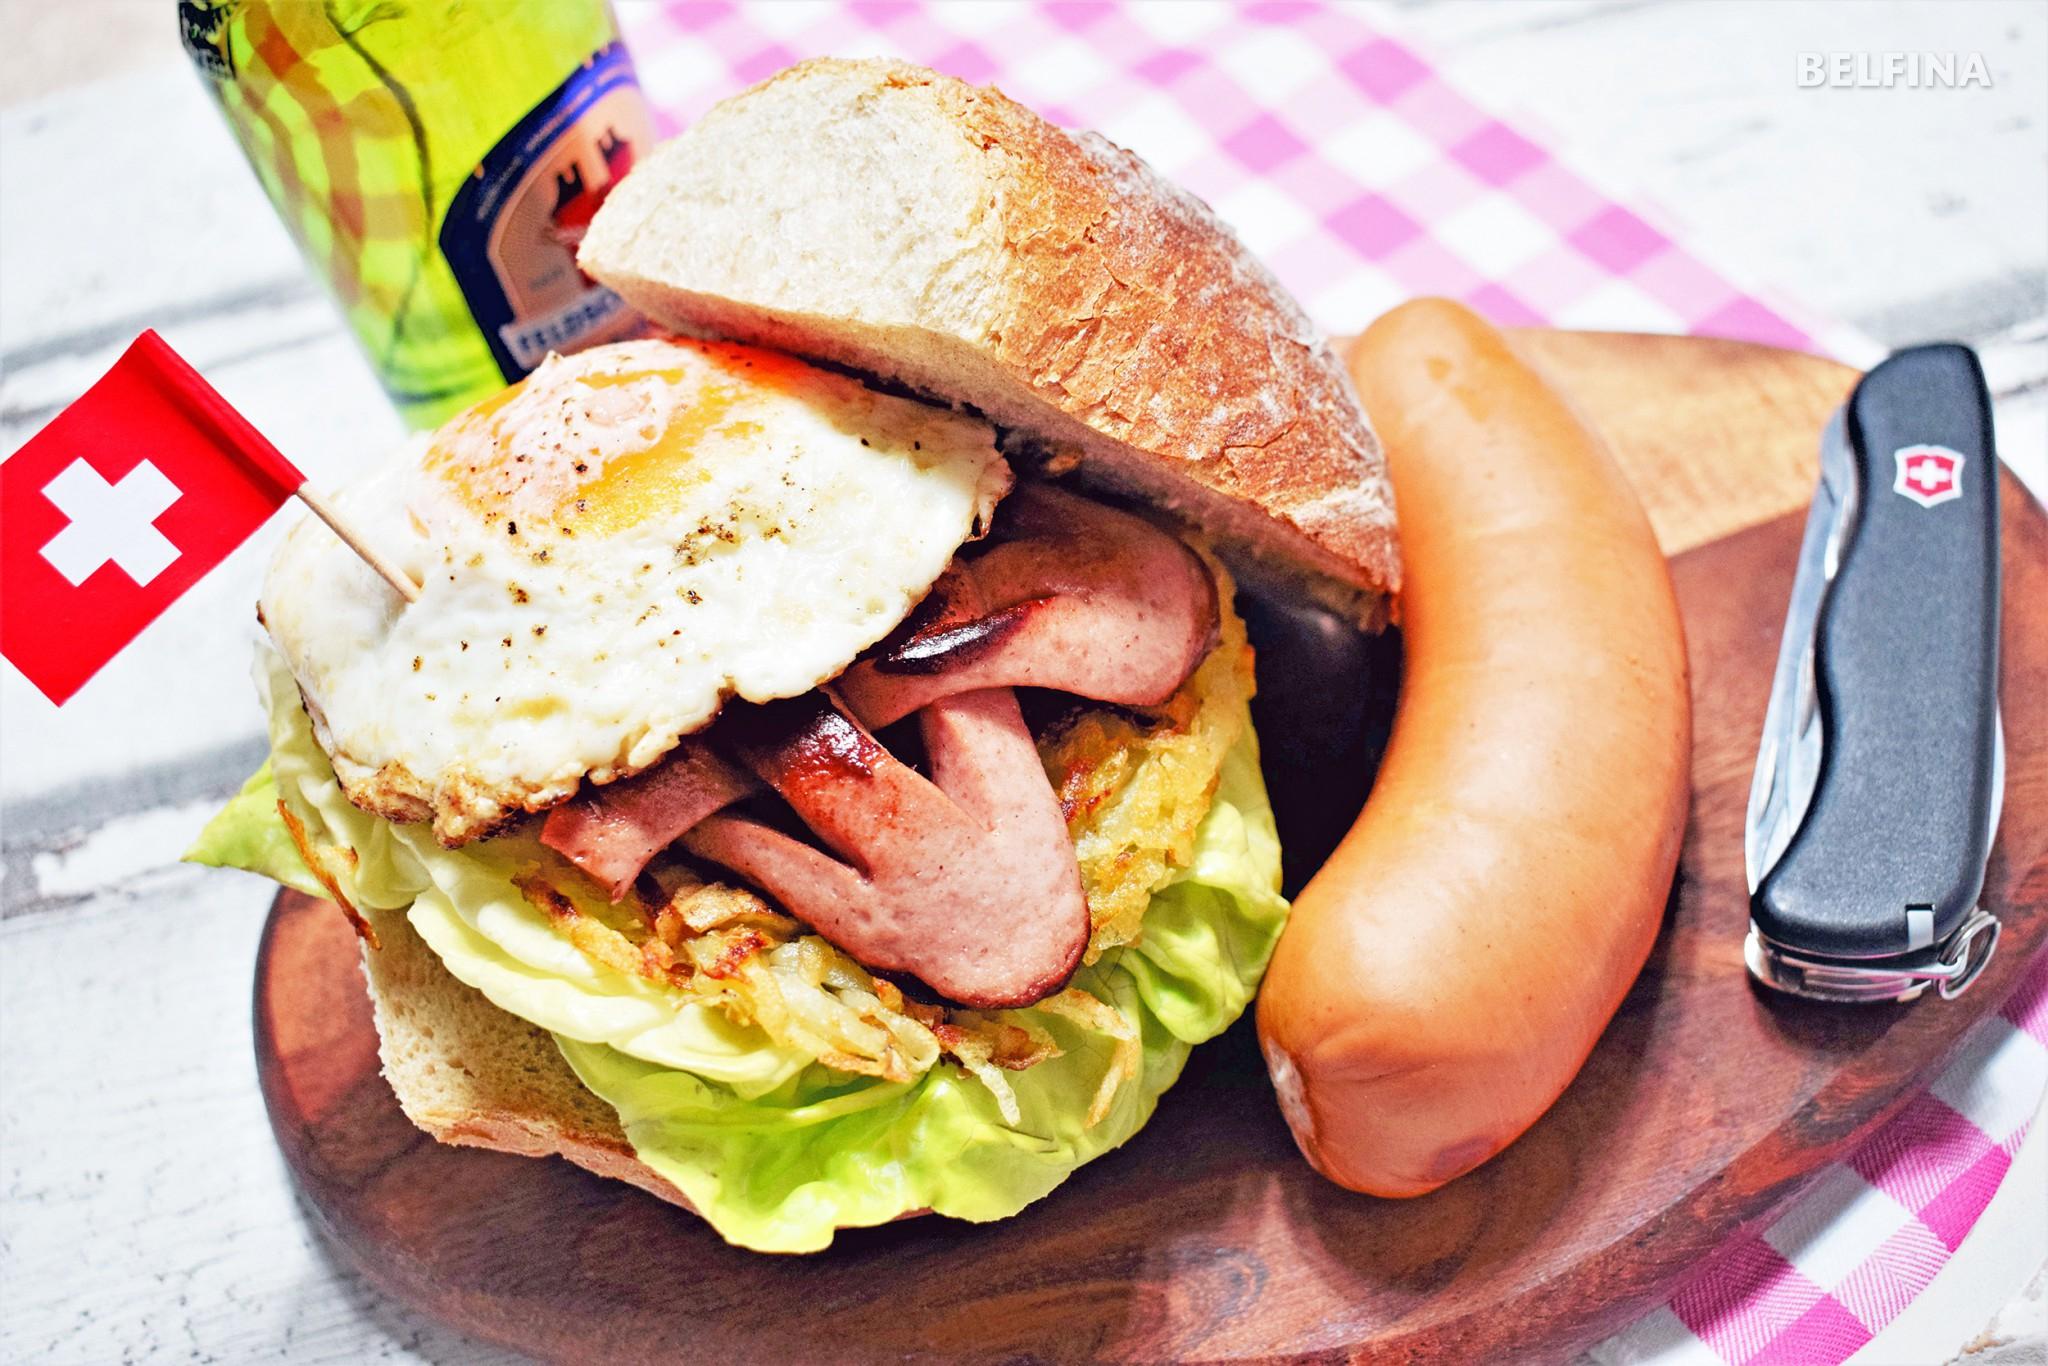 1.Augustburger